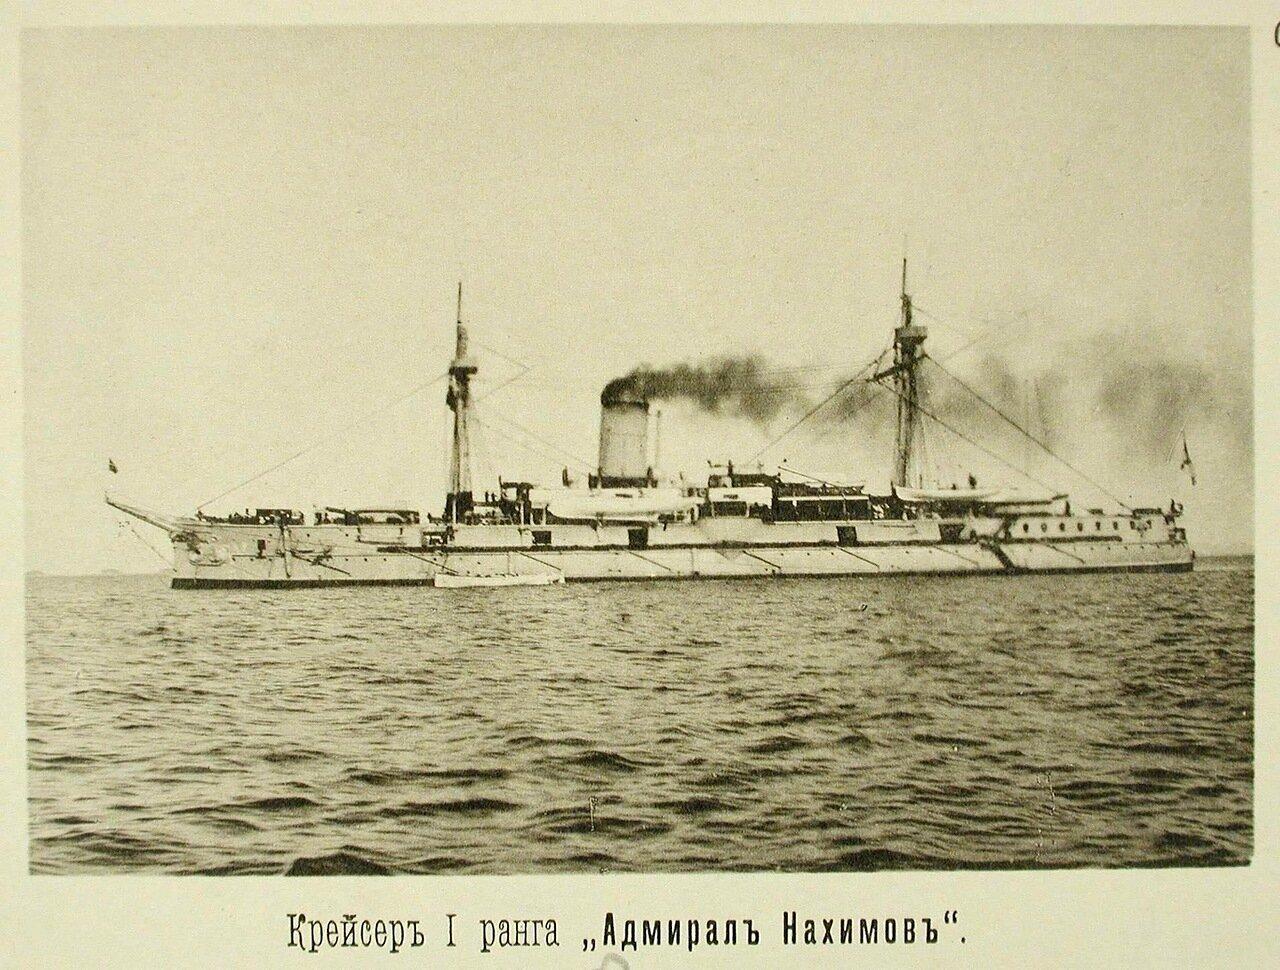 09. Крейсер I-го ранга Адмирал Нахимов. Чифу. 26 апреля 1895